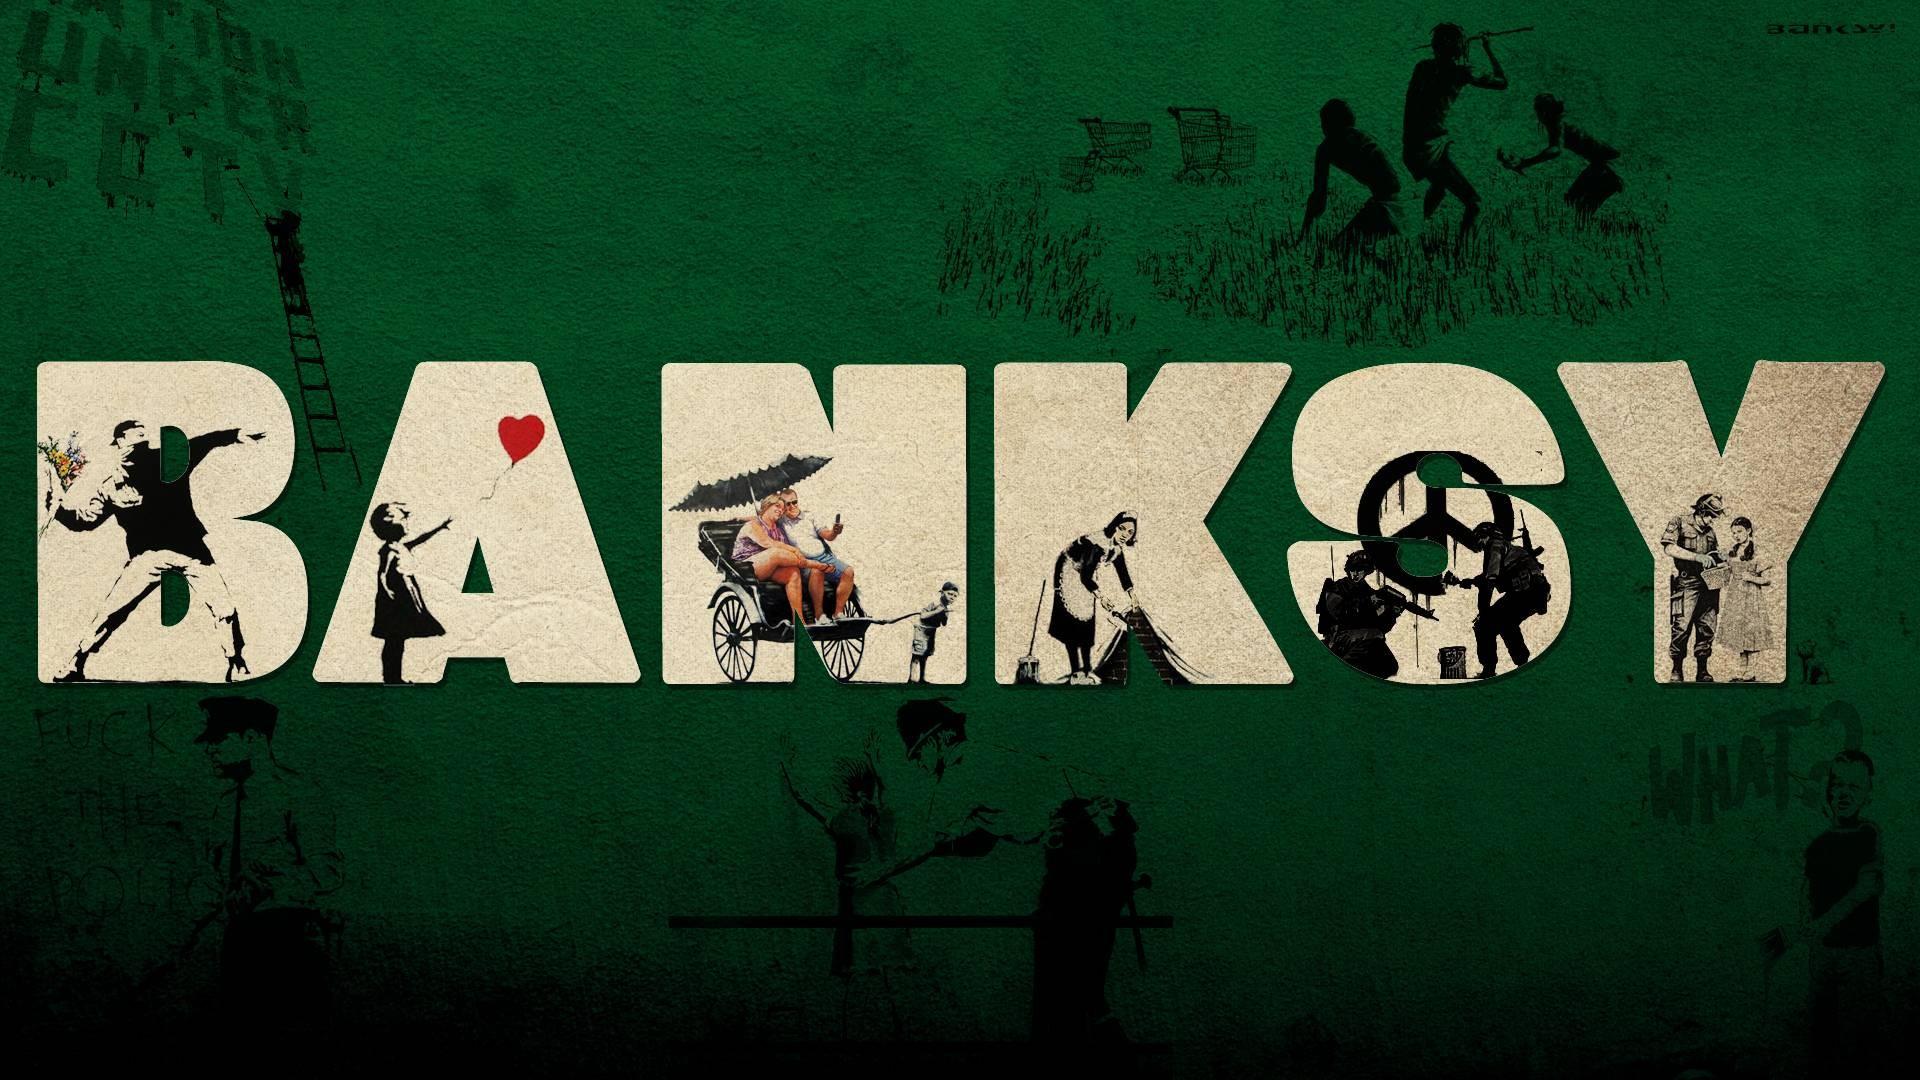 Banksy Wallpaper Download Free Full Hd Backgrounds For Desktop